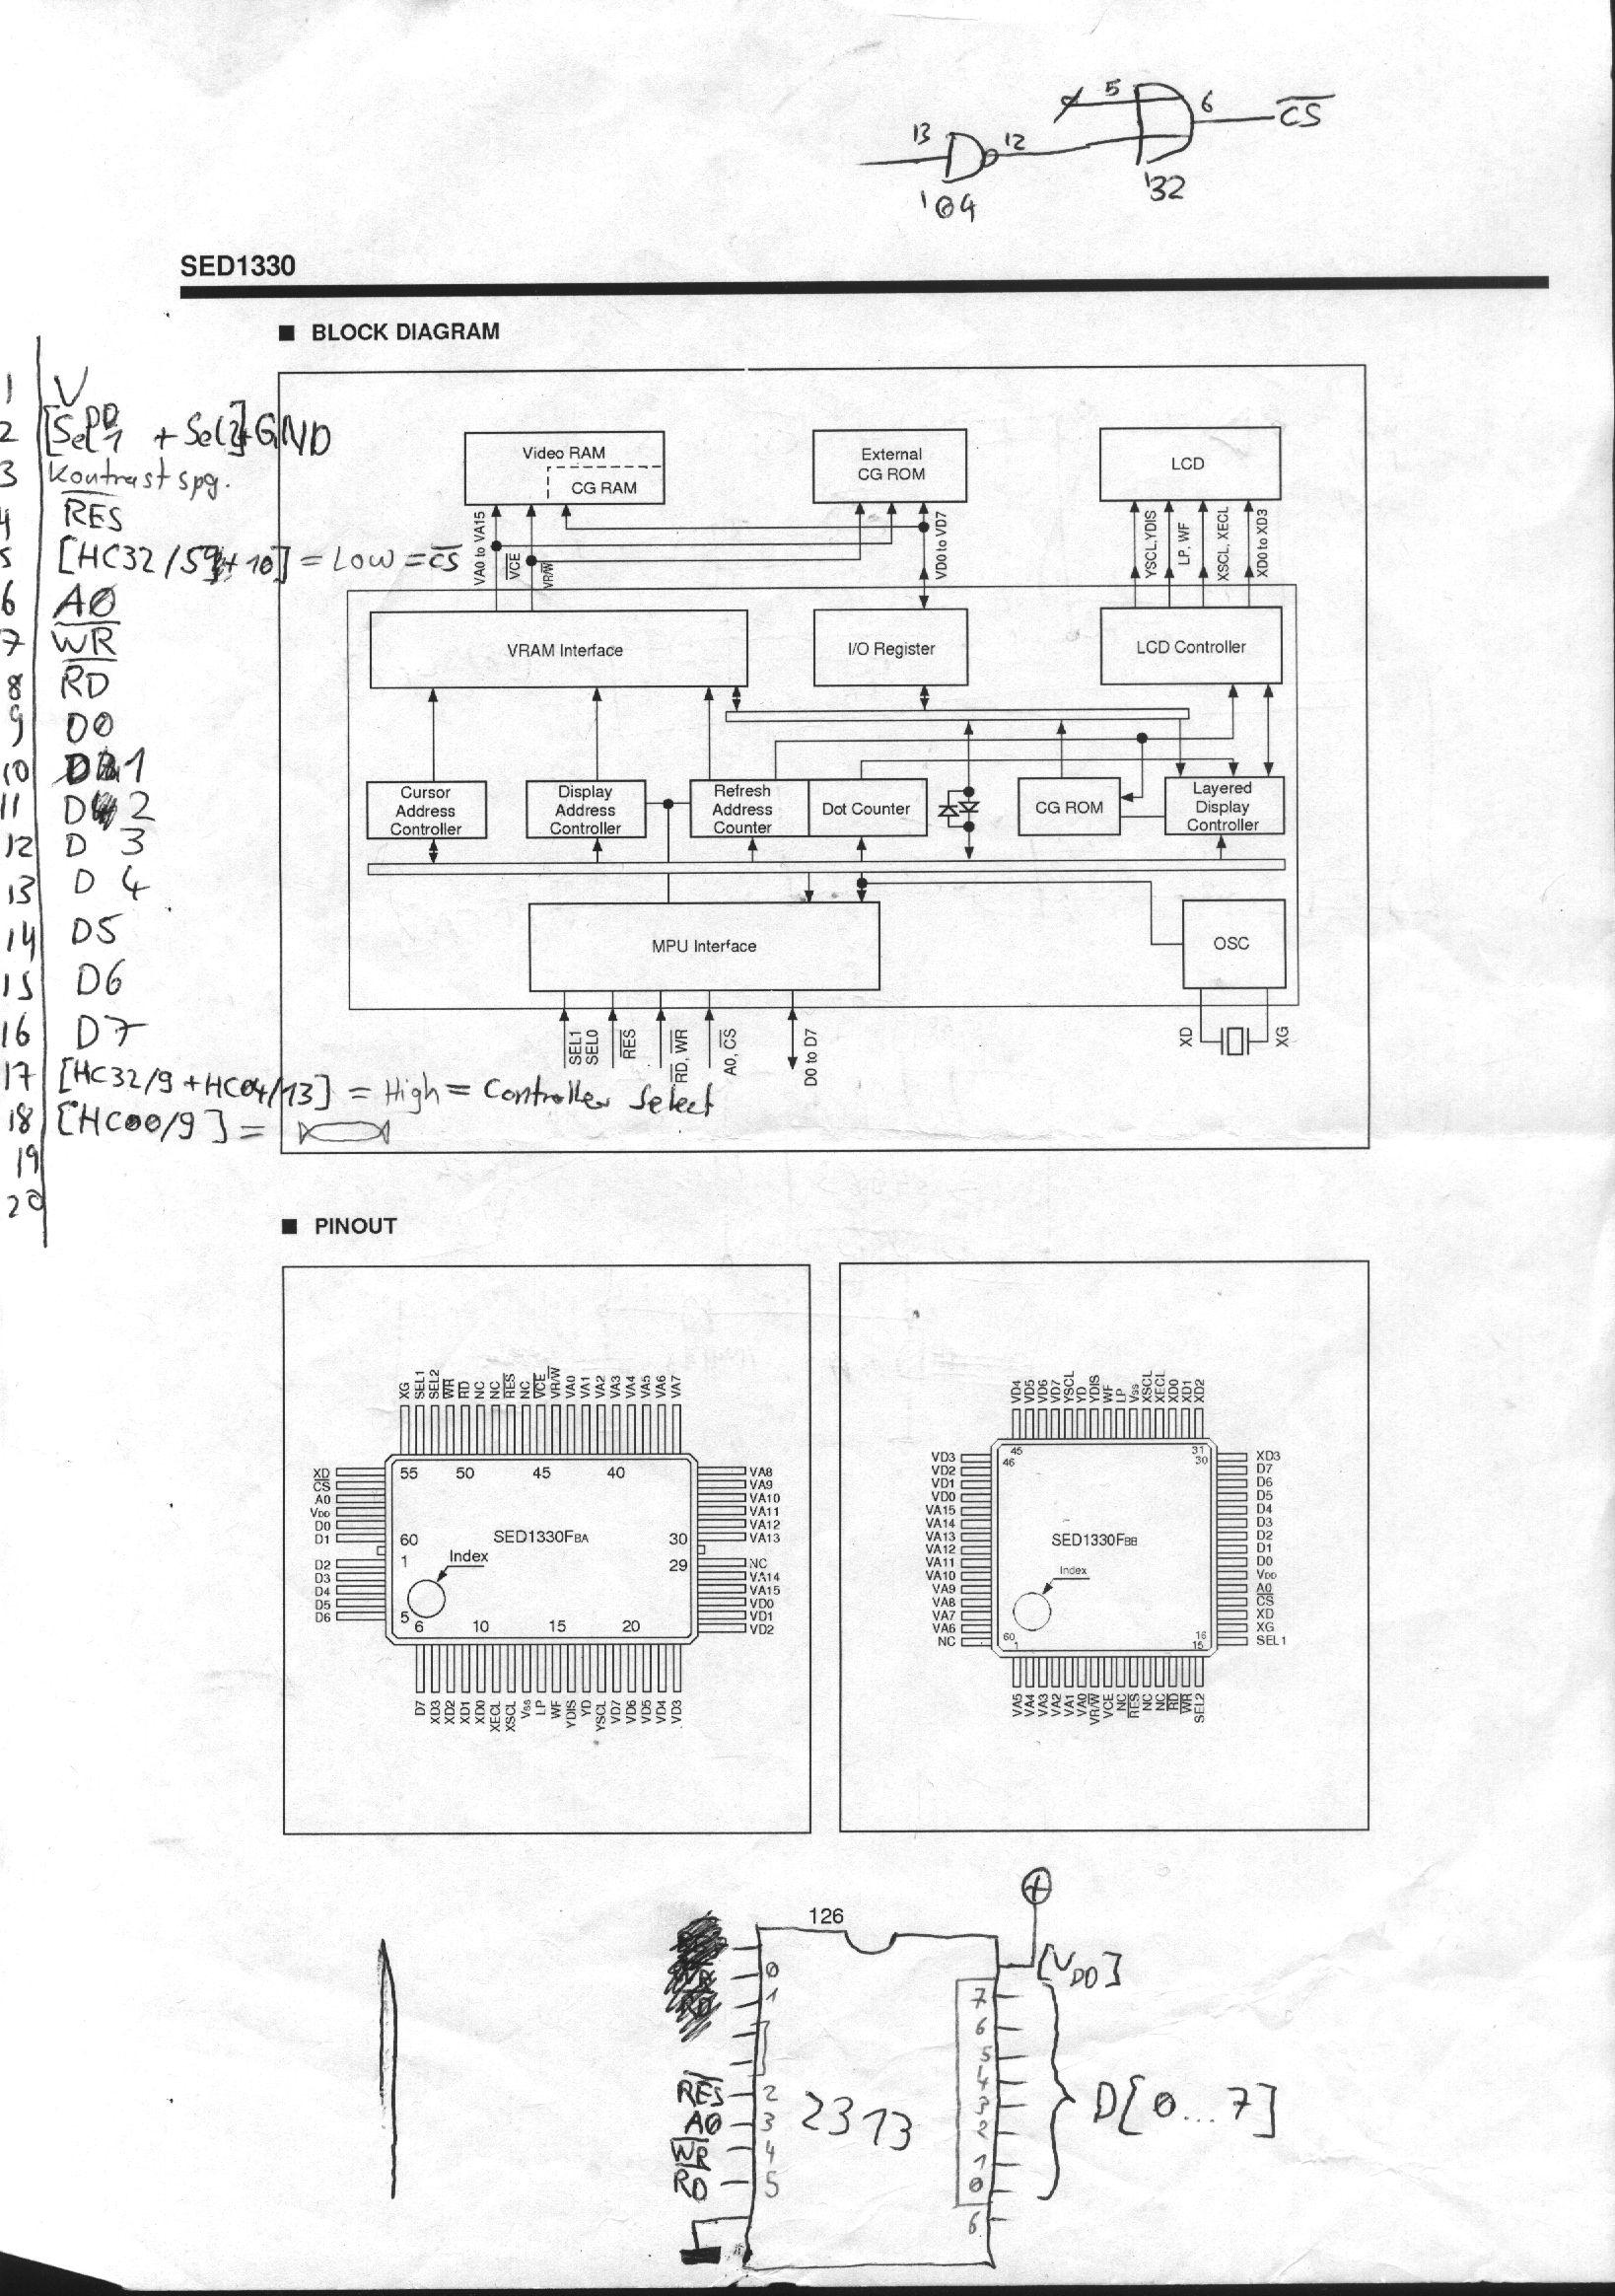 Charmant Telefon 66 Block Schaltplan Ideen - Der Schaltplan ...